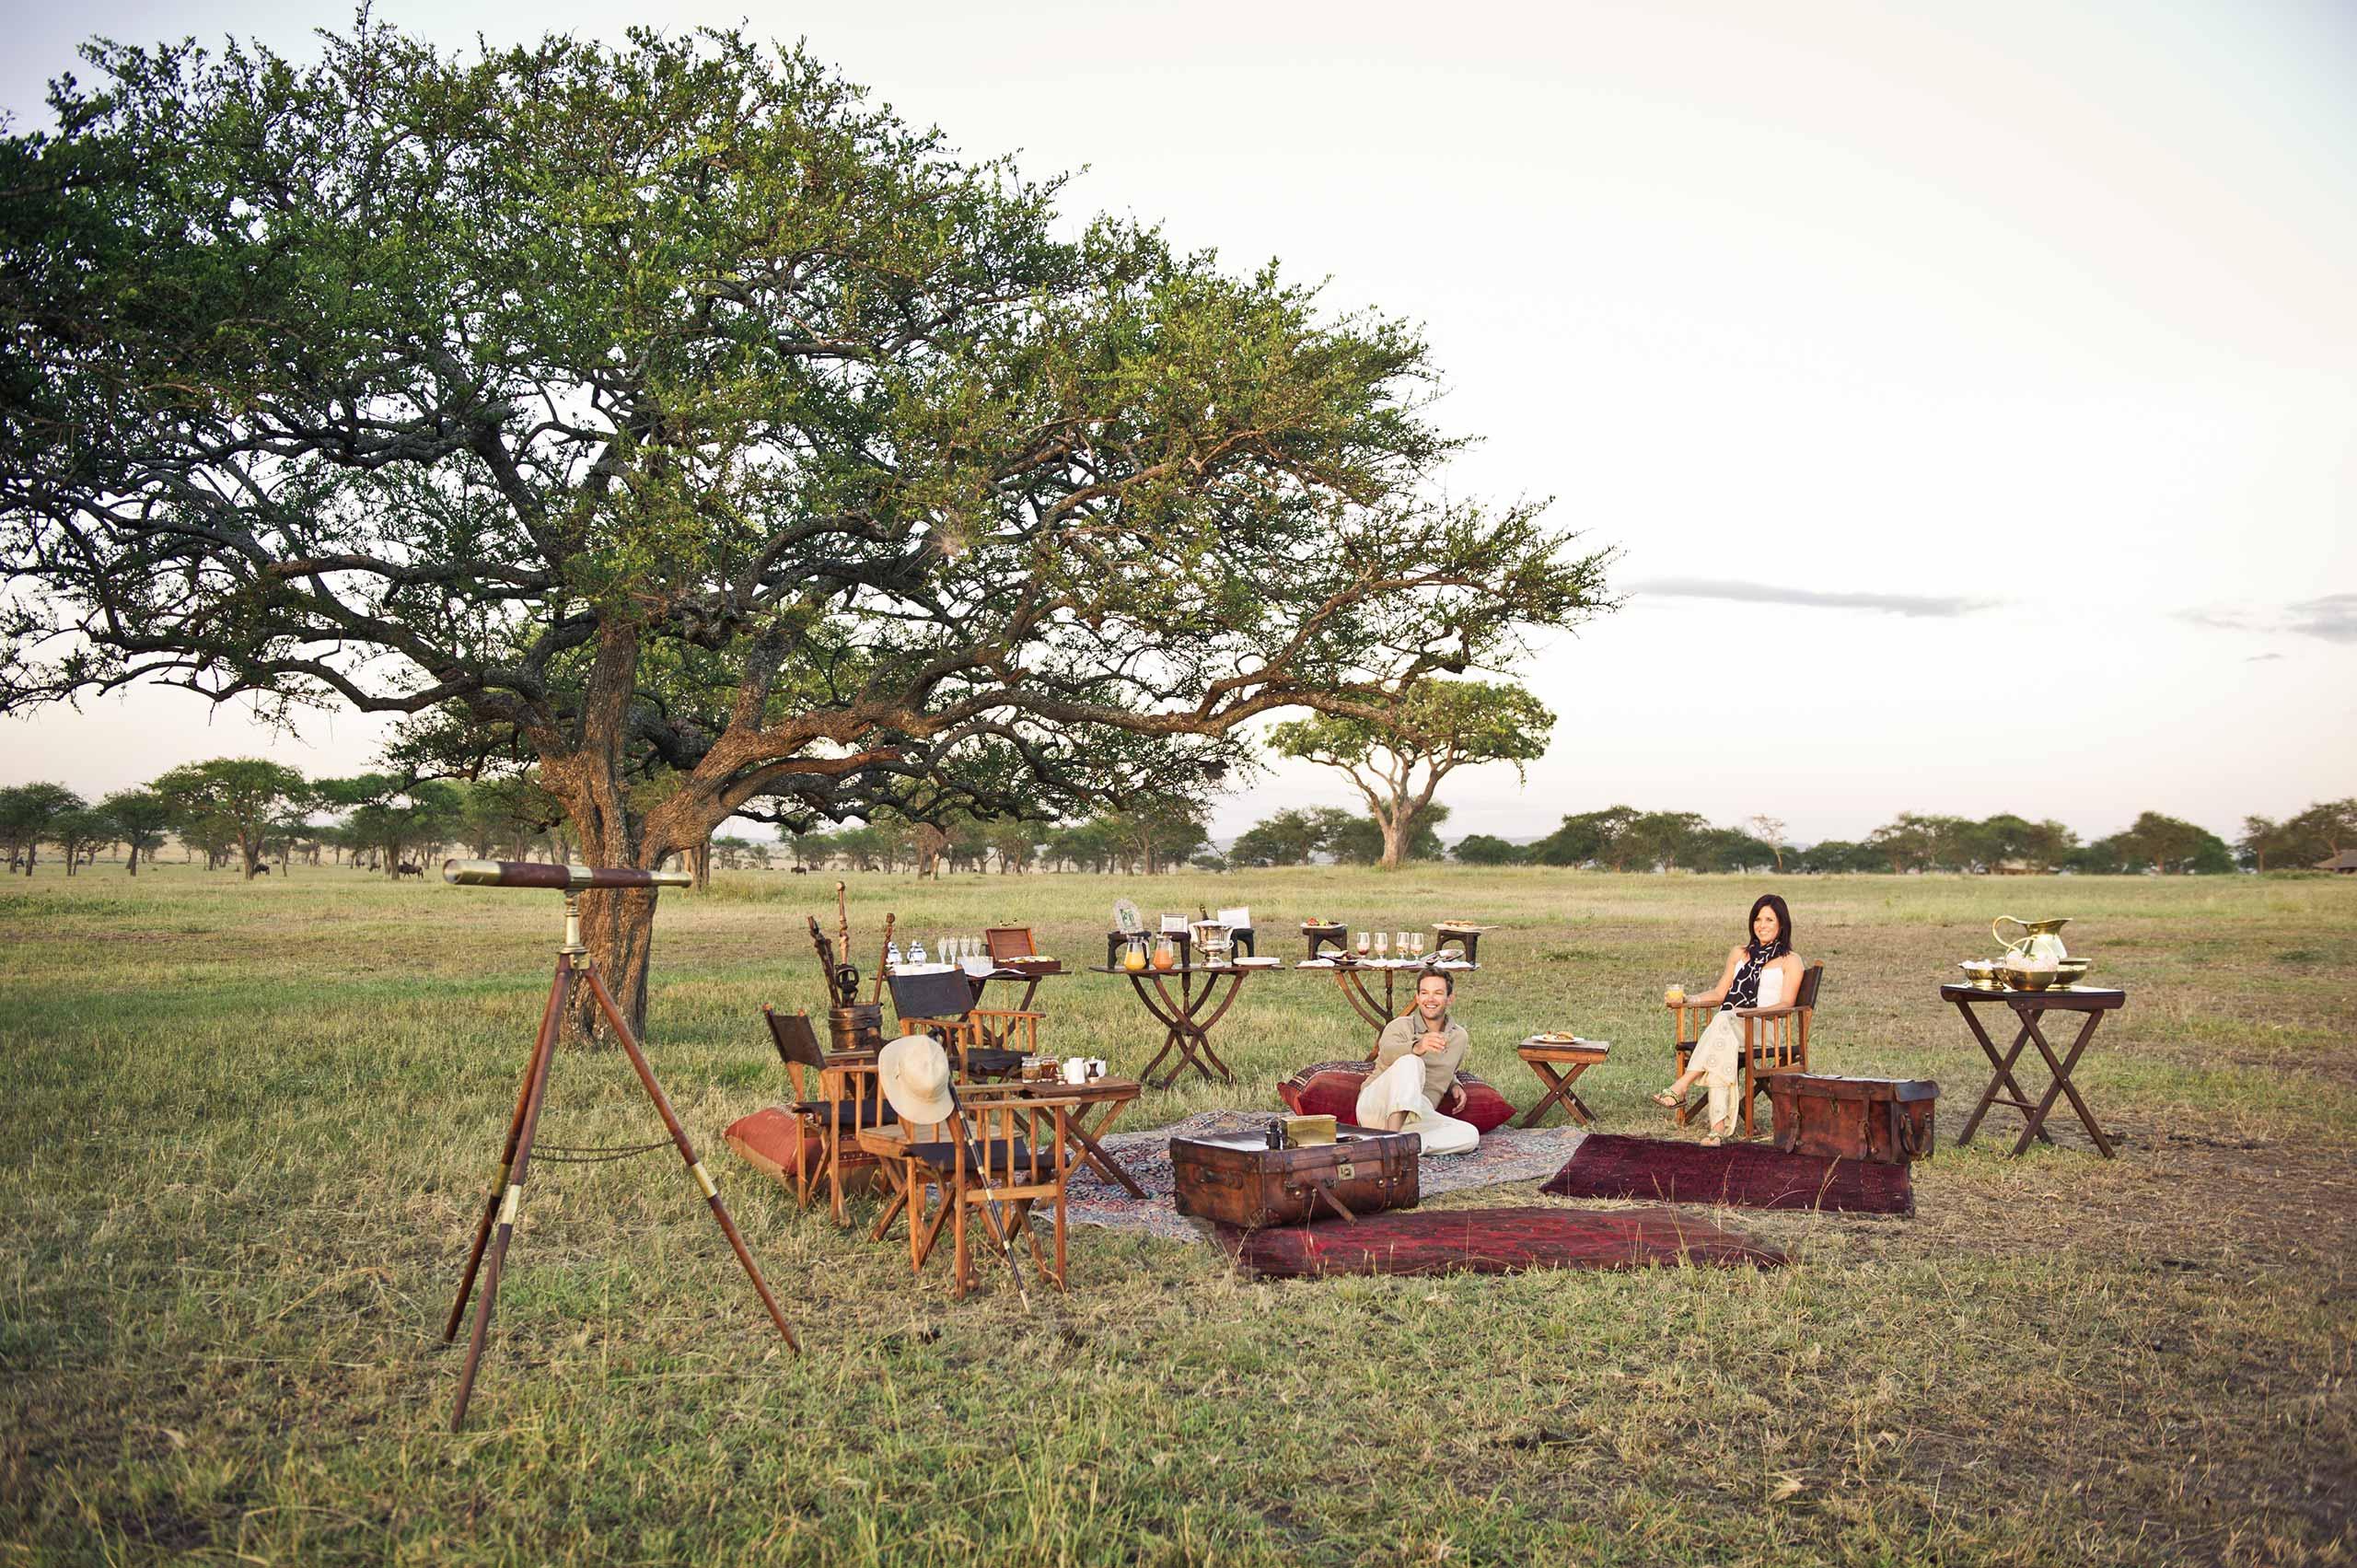 enkosi-africa-safari-tanzania-grumeti-Singita-Sabora-Picnic